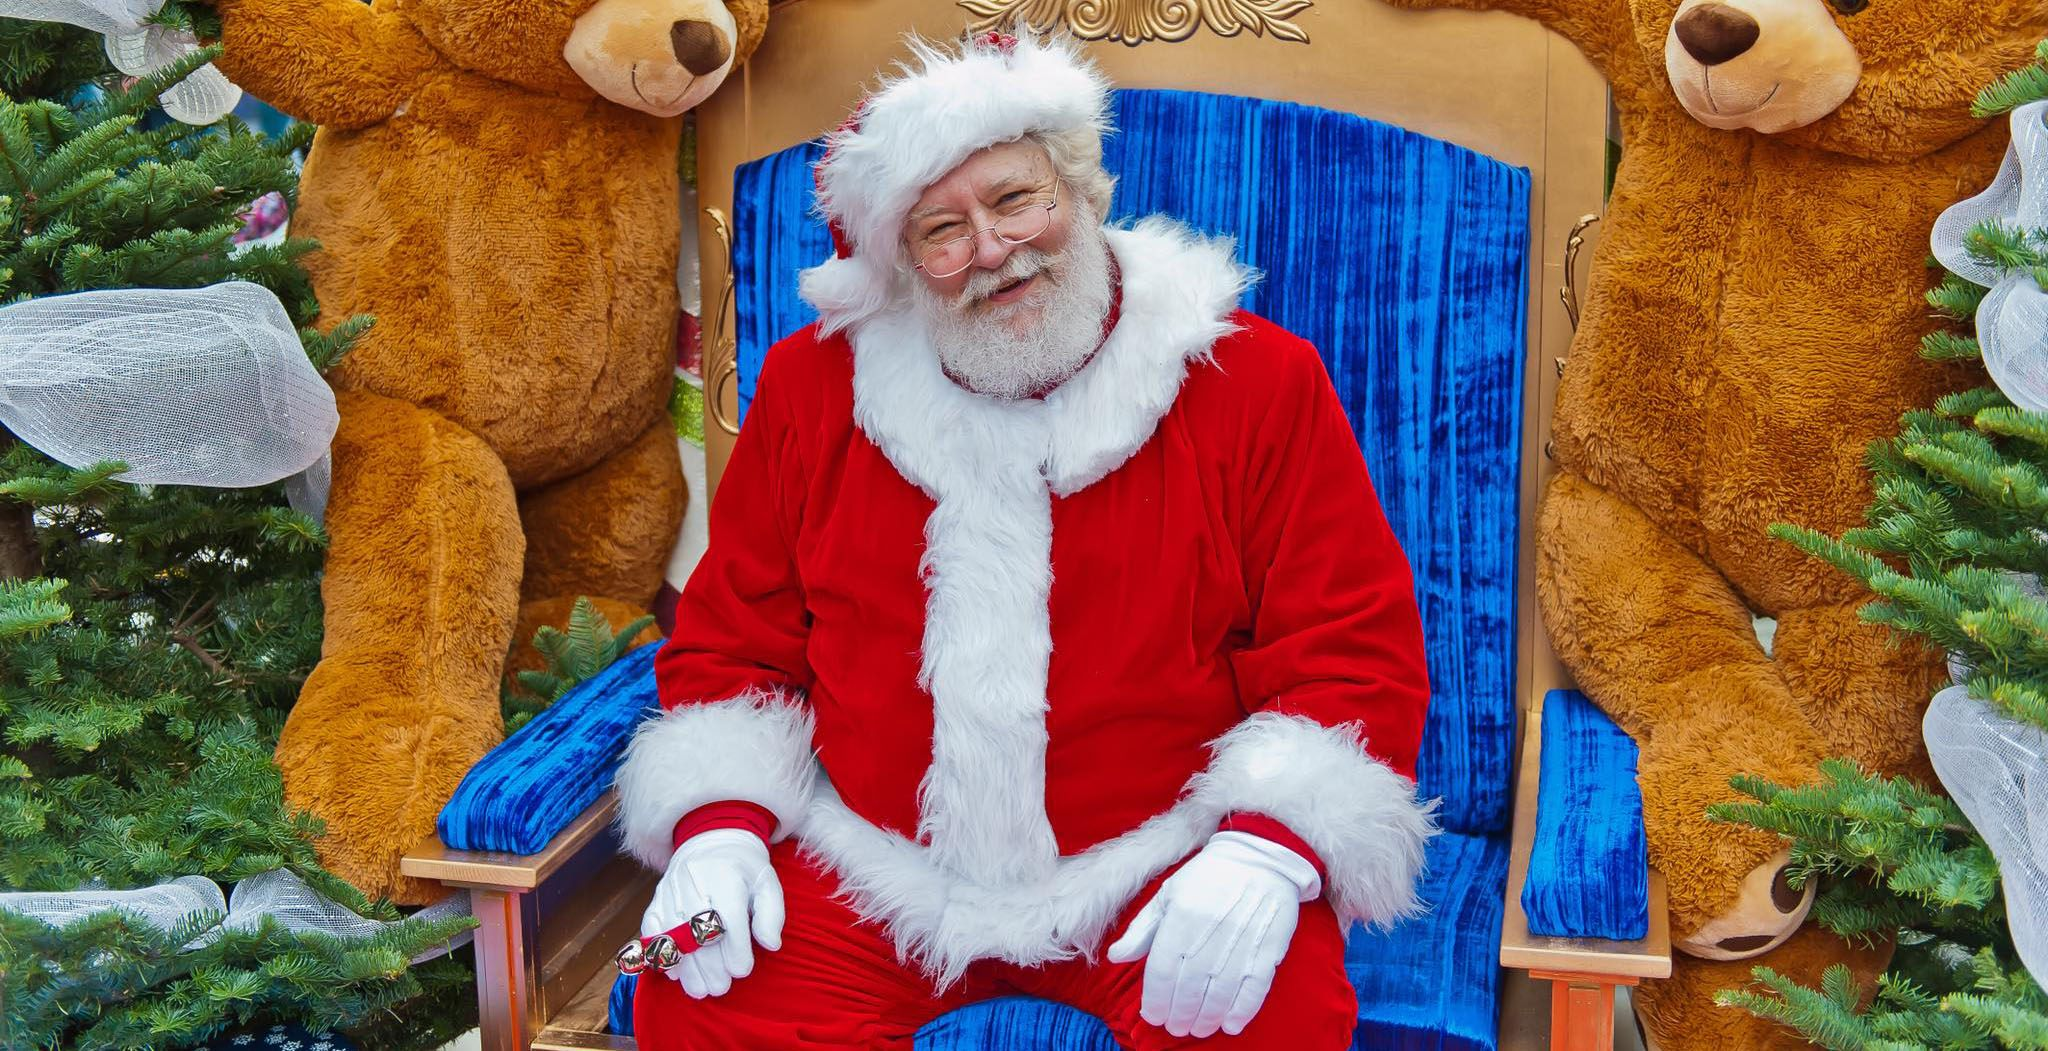 Father christmas at the vancouver santa claus parade 2017 facebook